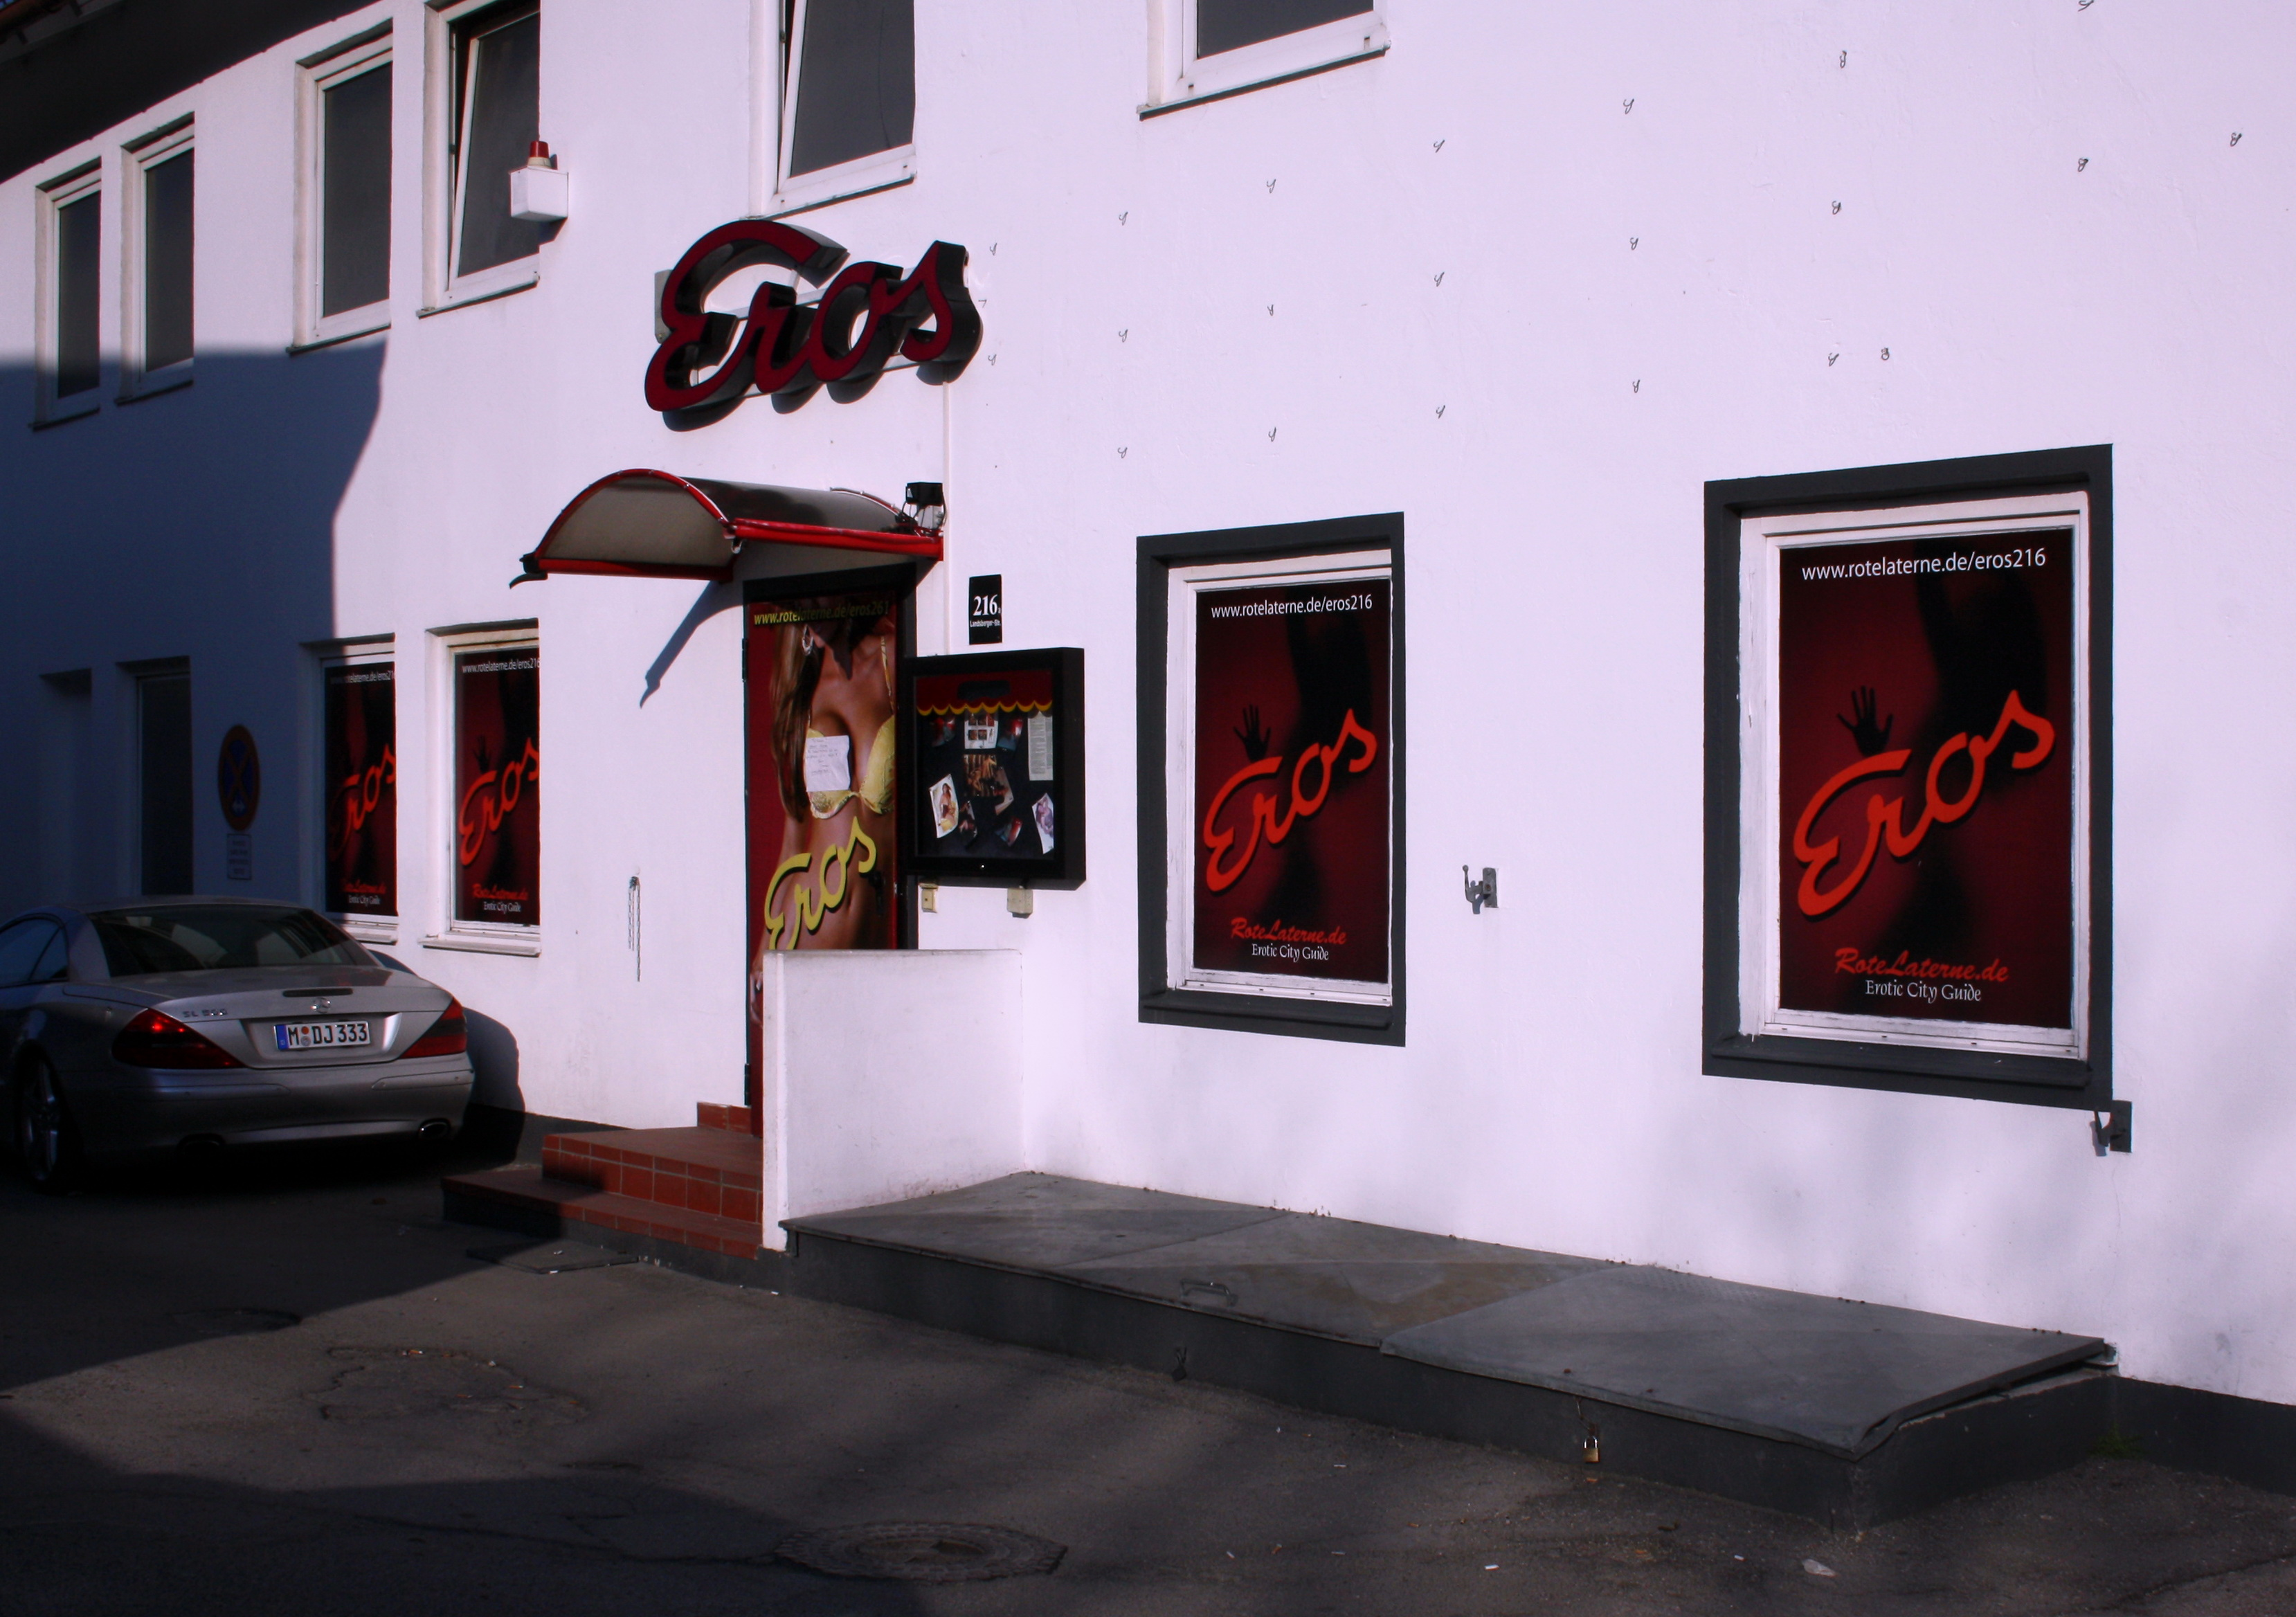 Eros center germany